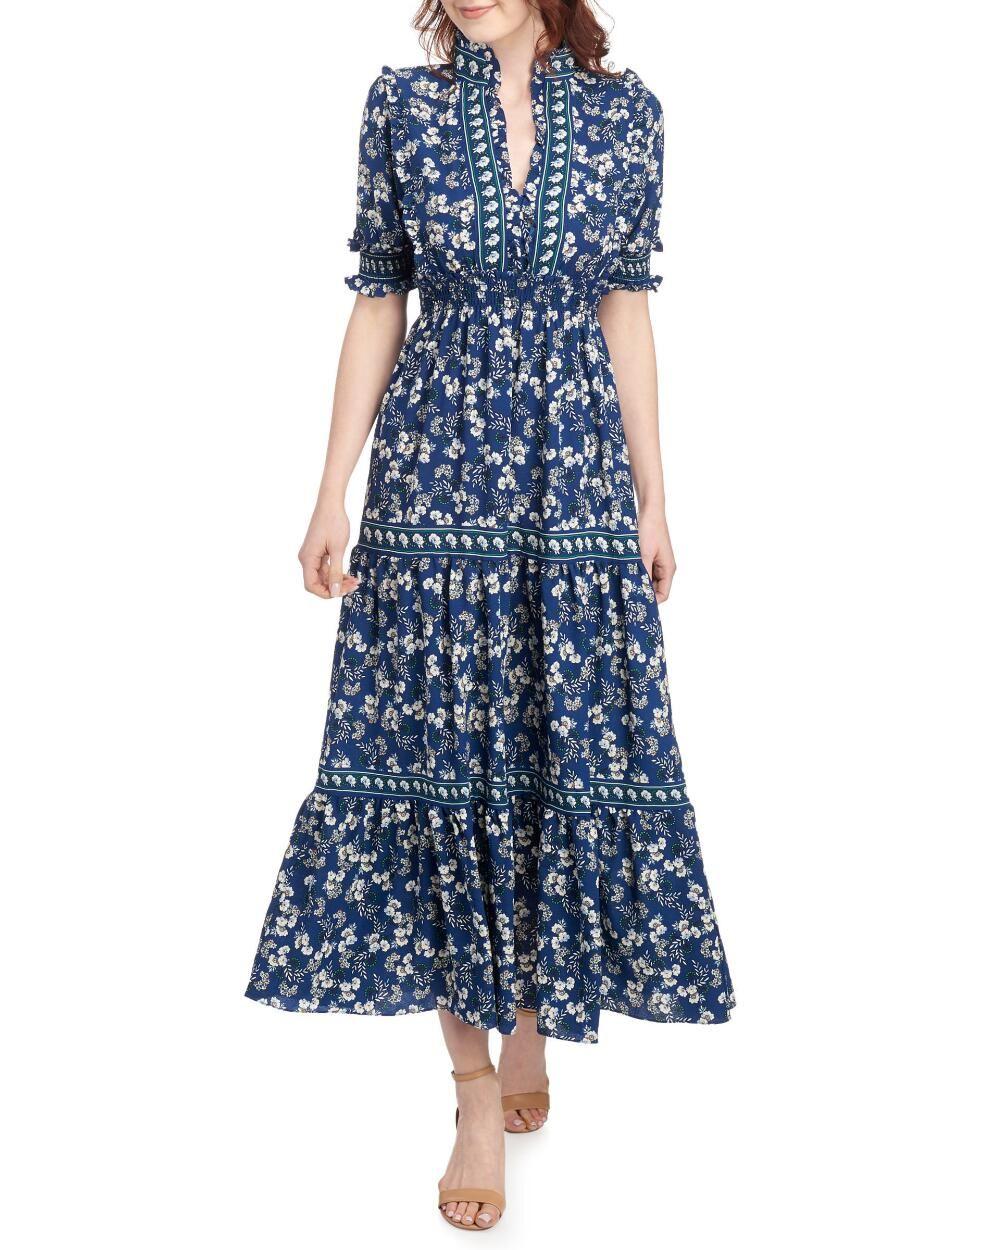 Pin By Sara Chinchilla On Tus Me Gusta De Pinterest Occasion Maxi Dresses Style Maxi Dress Maxi Dress [ 1250 x 1000 Pixel ]